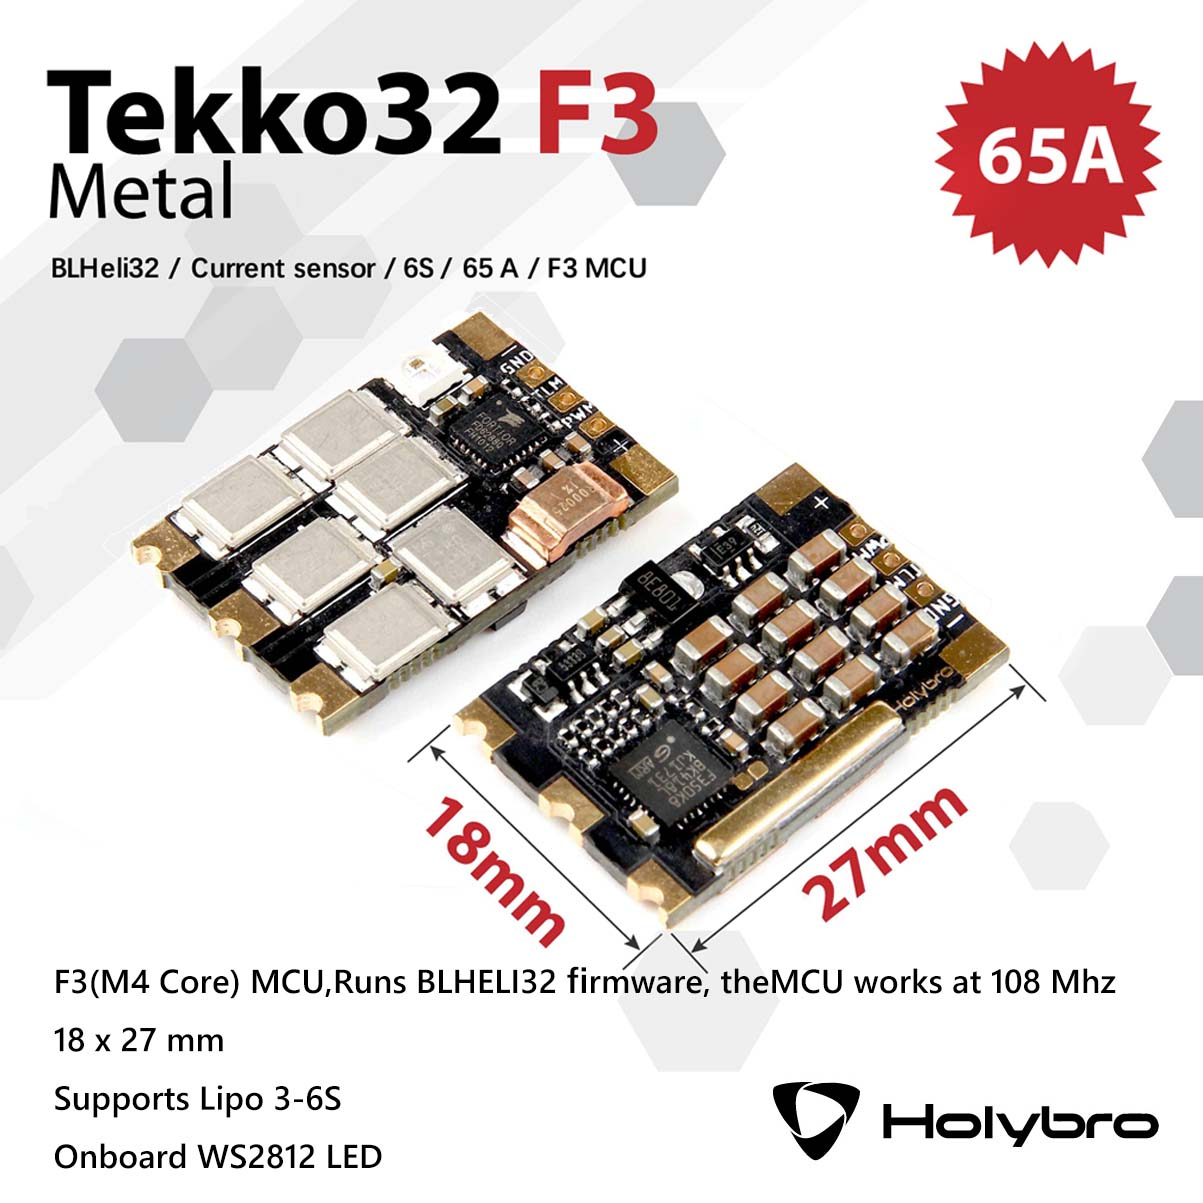 Holybro Tekko32 F3 Runs BLHELI32 Firmware Metal ESC Under Props Support Lipo3-6S